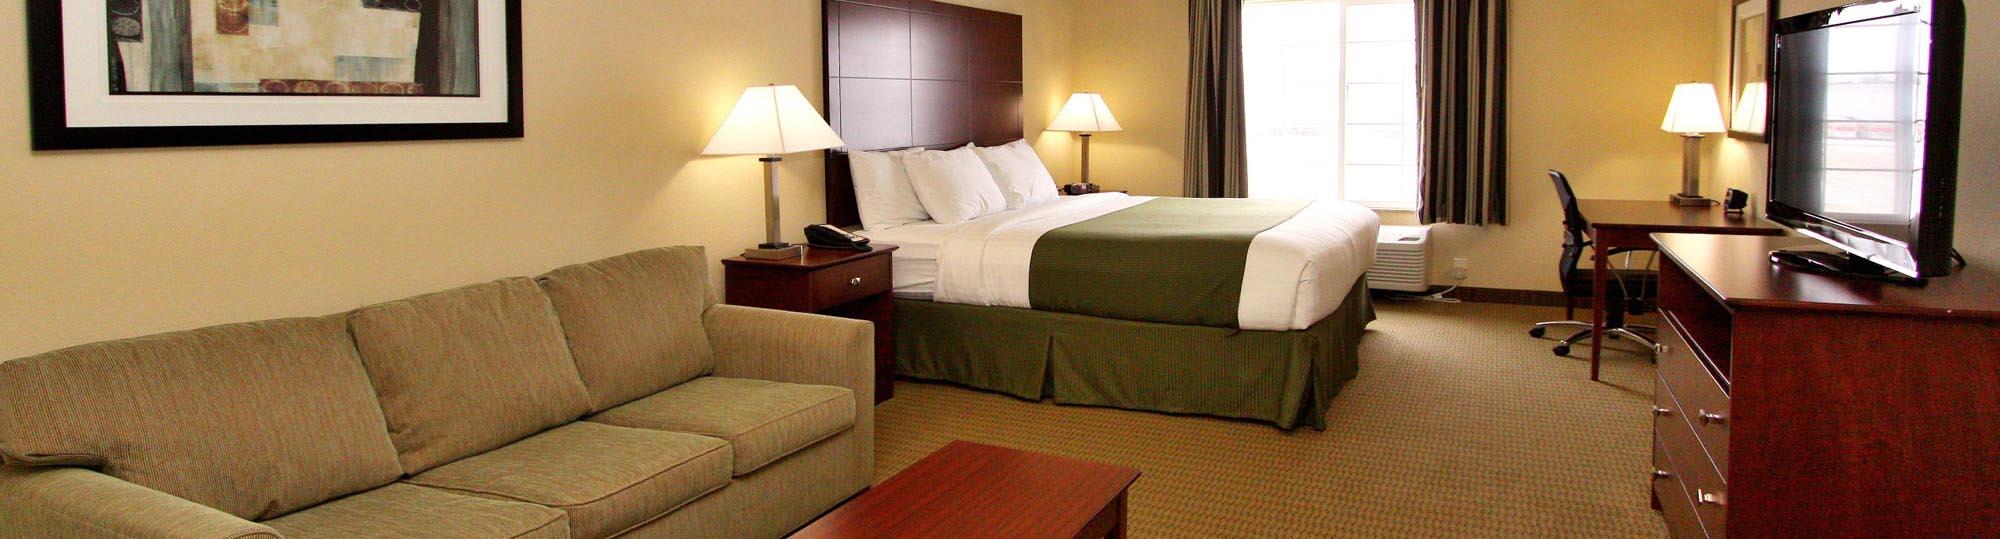 Cobblestone Hotel and Suites Seward